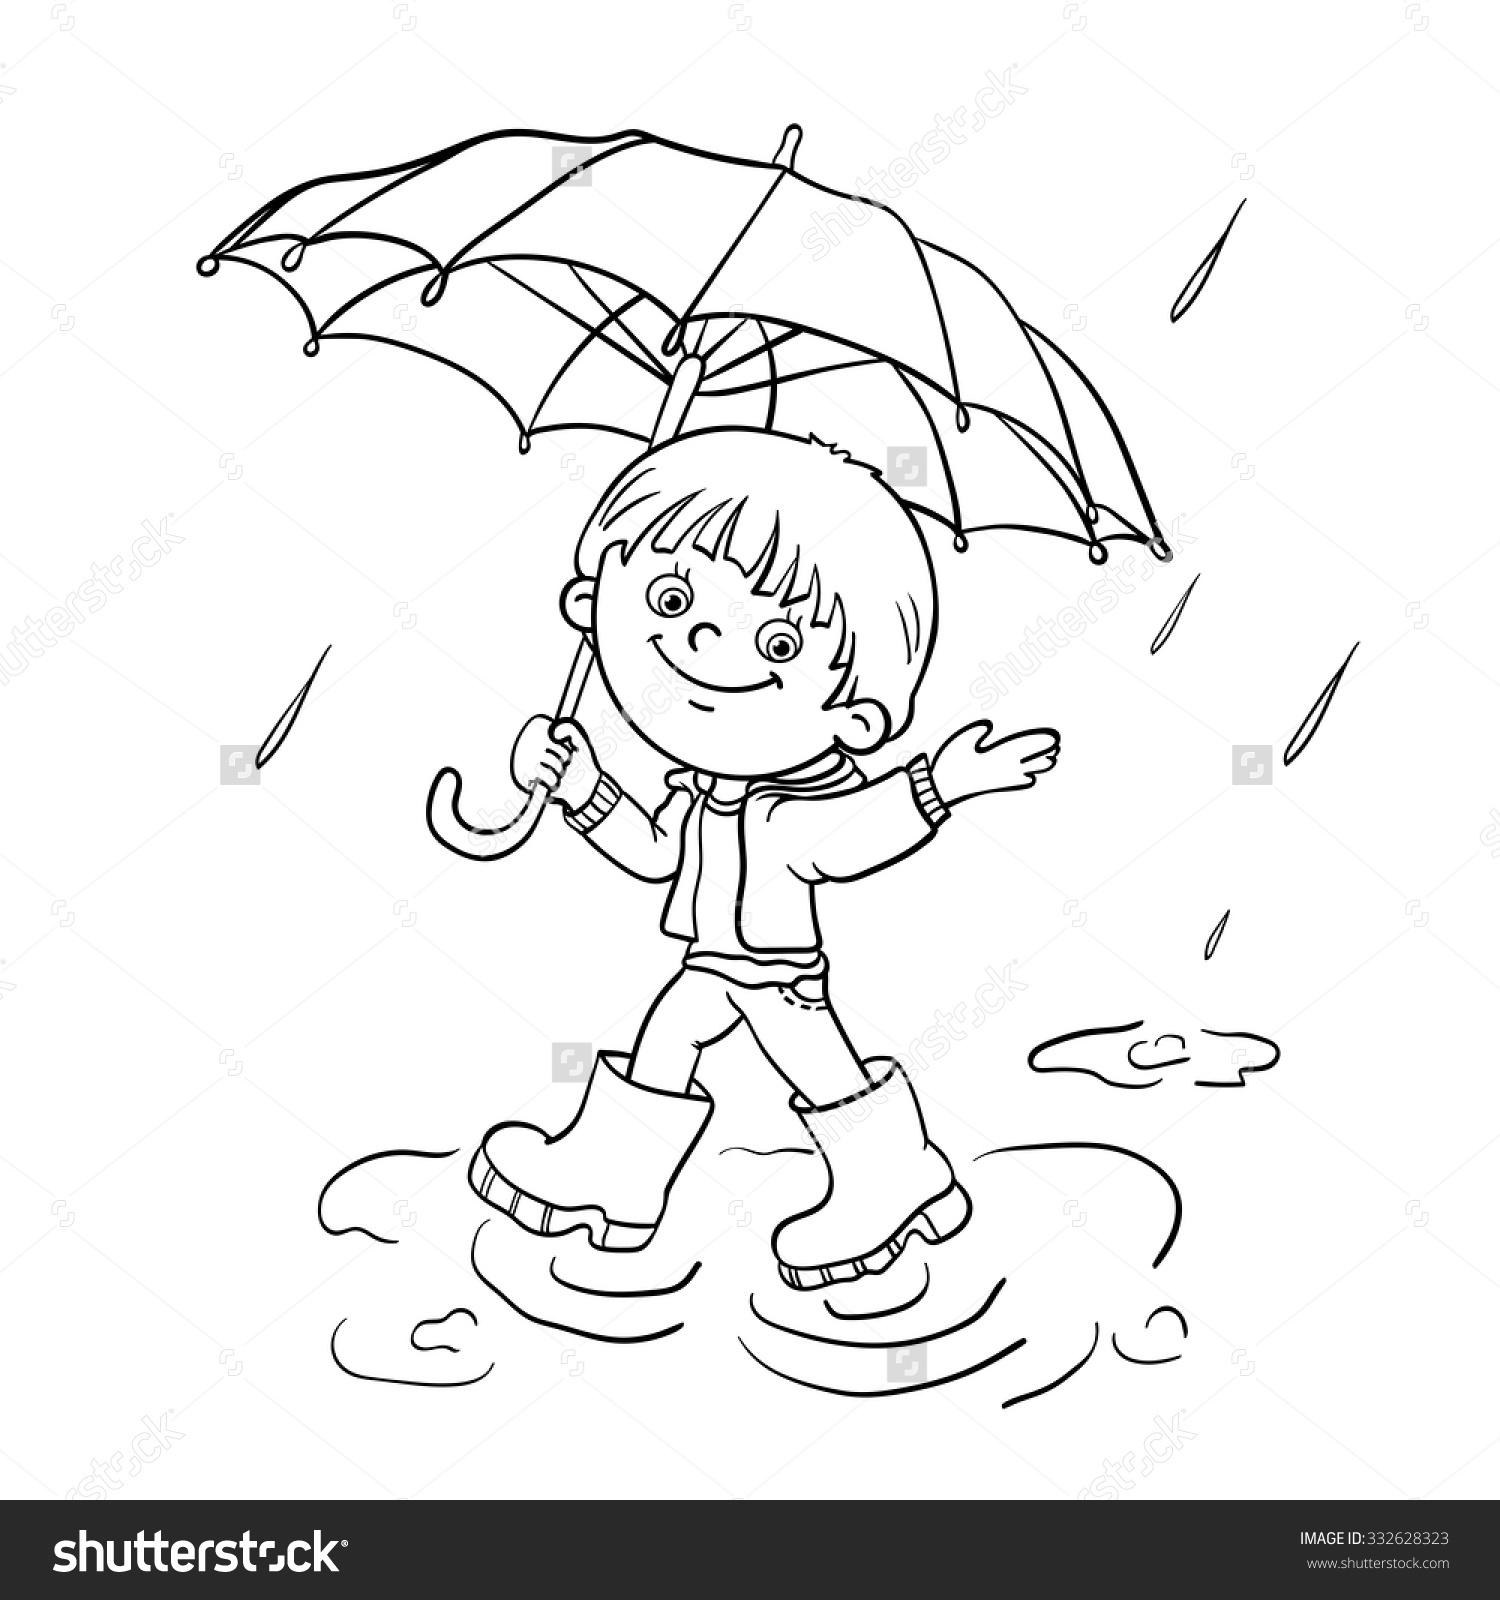 Rain Drawing At Getdrawings